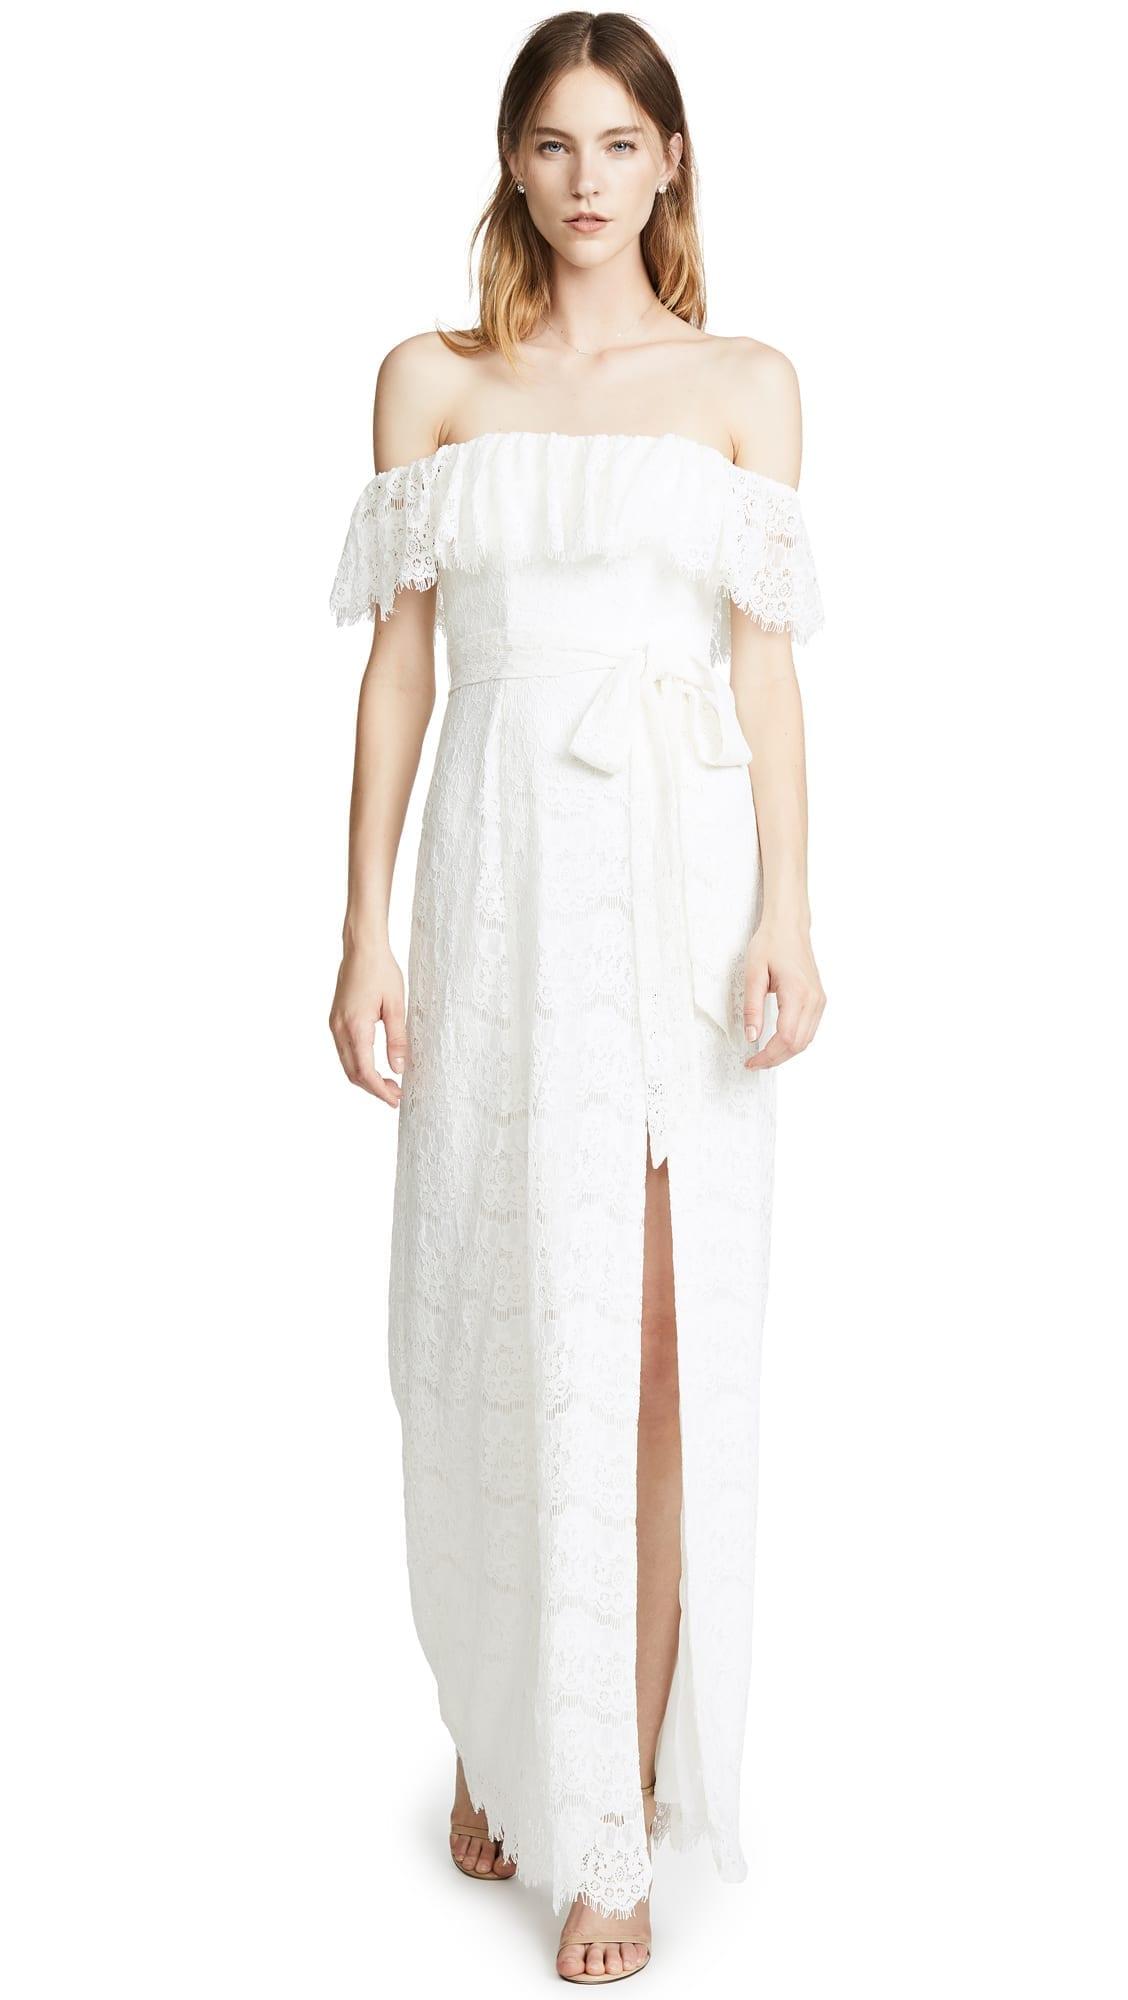 YUMI KIM Maribella Maxi White Dress